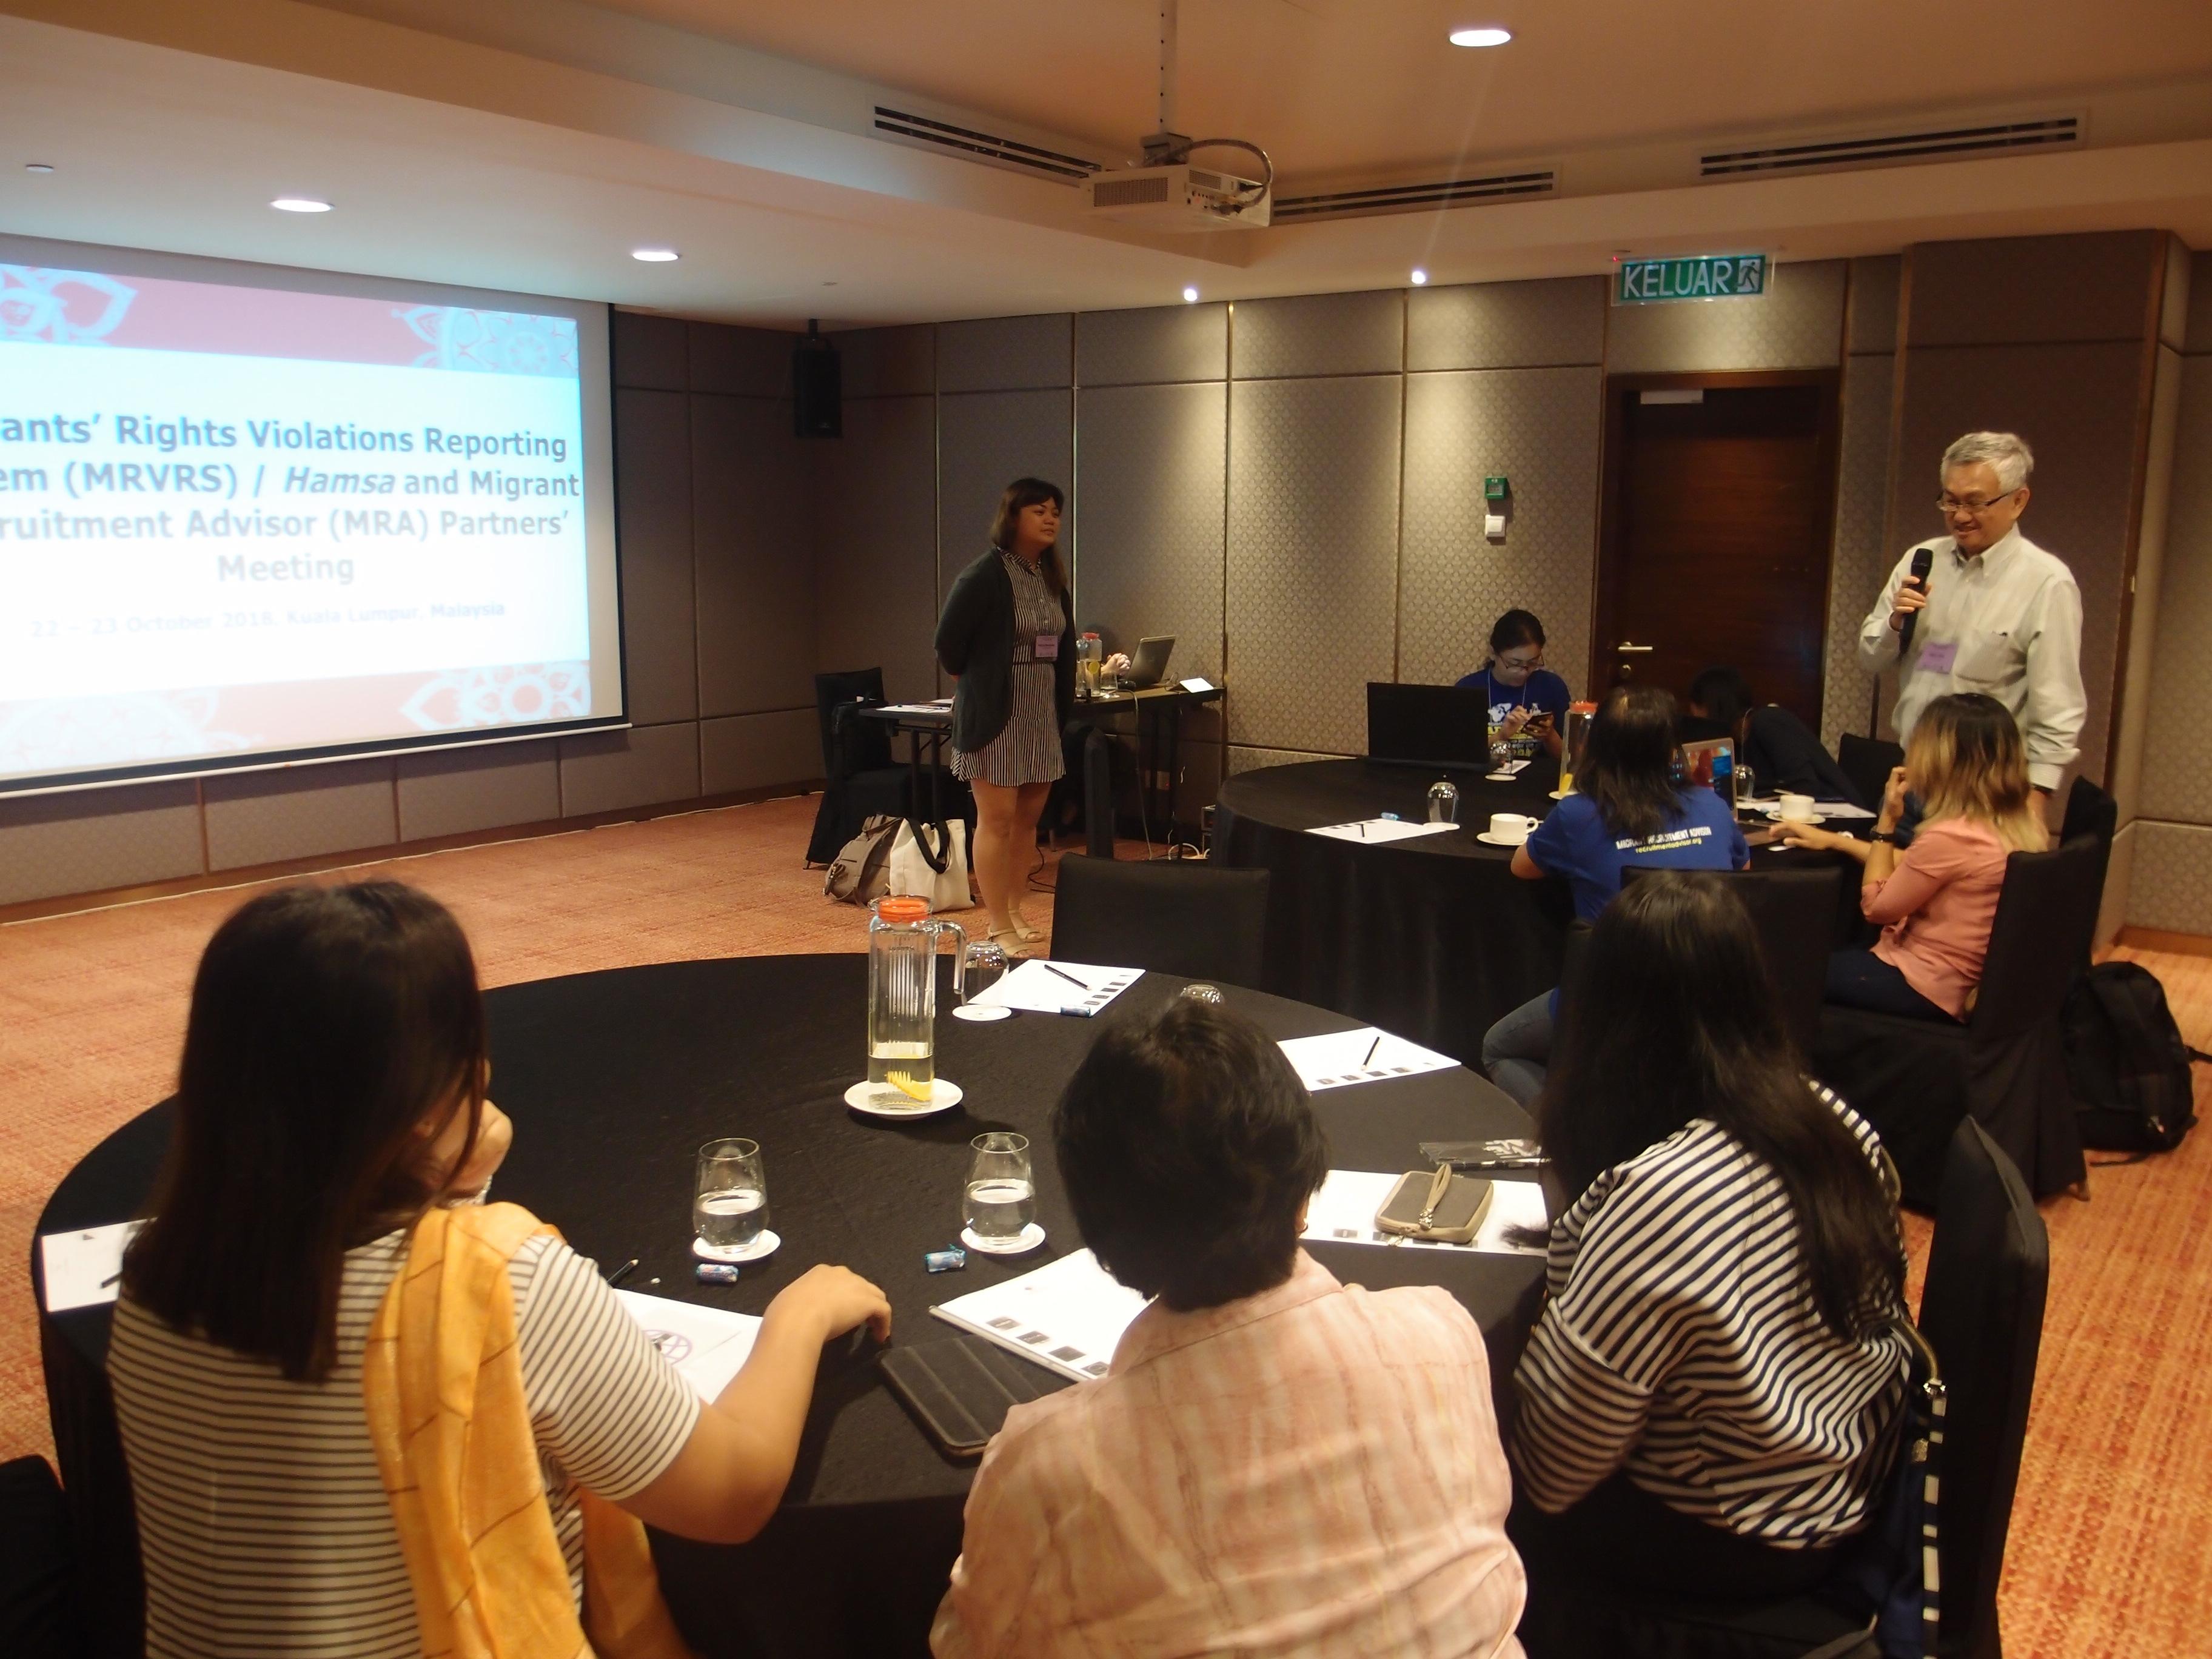 Hamsa complaints mechanism and Migrant Recruitment Advisor